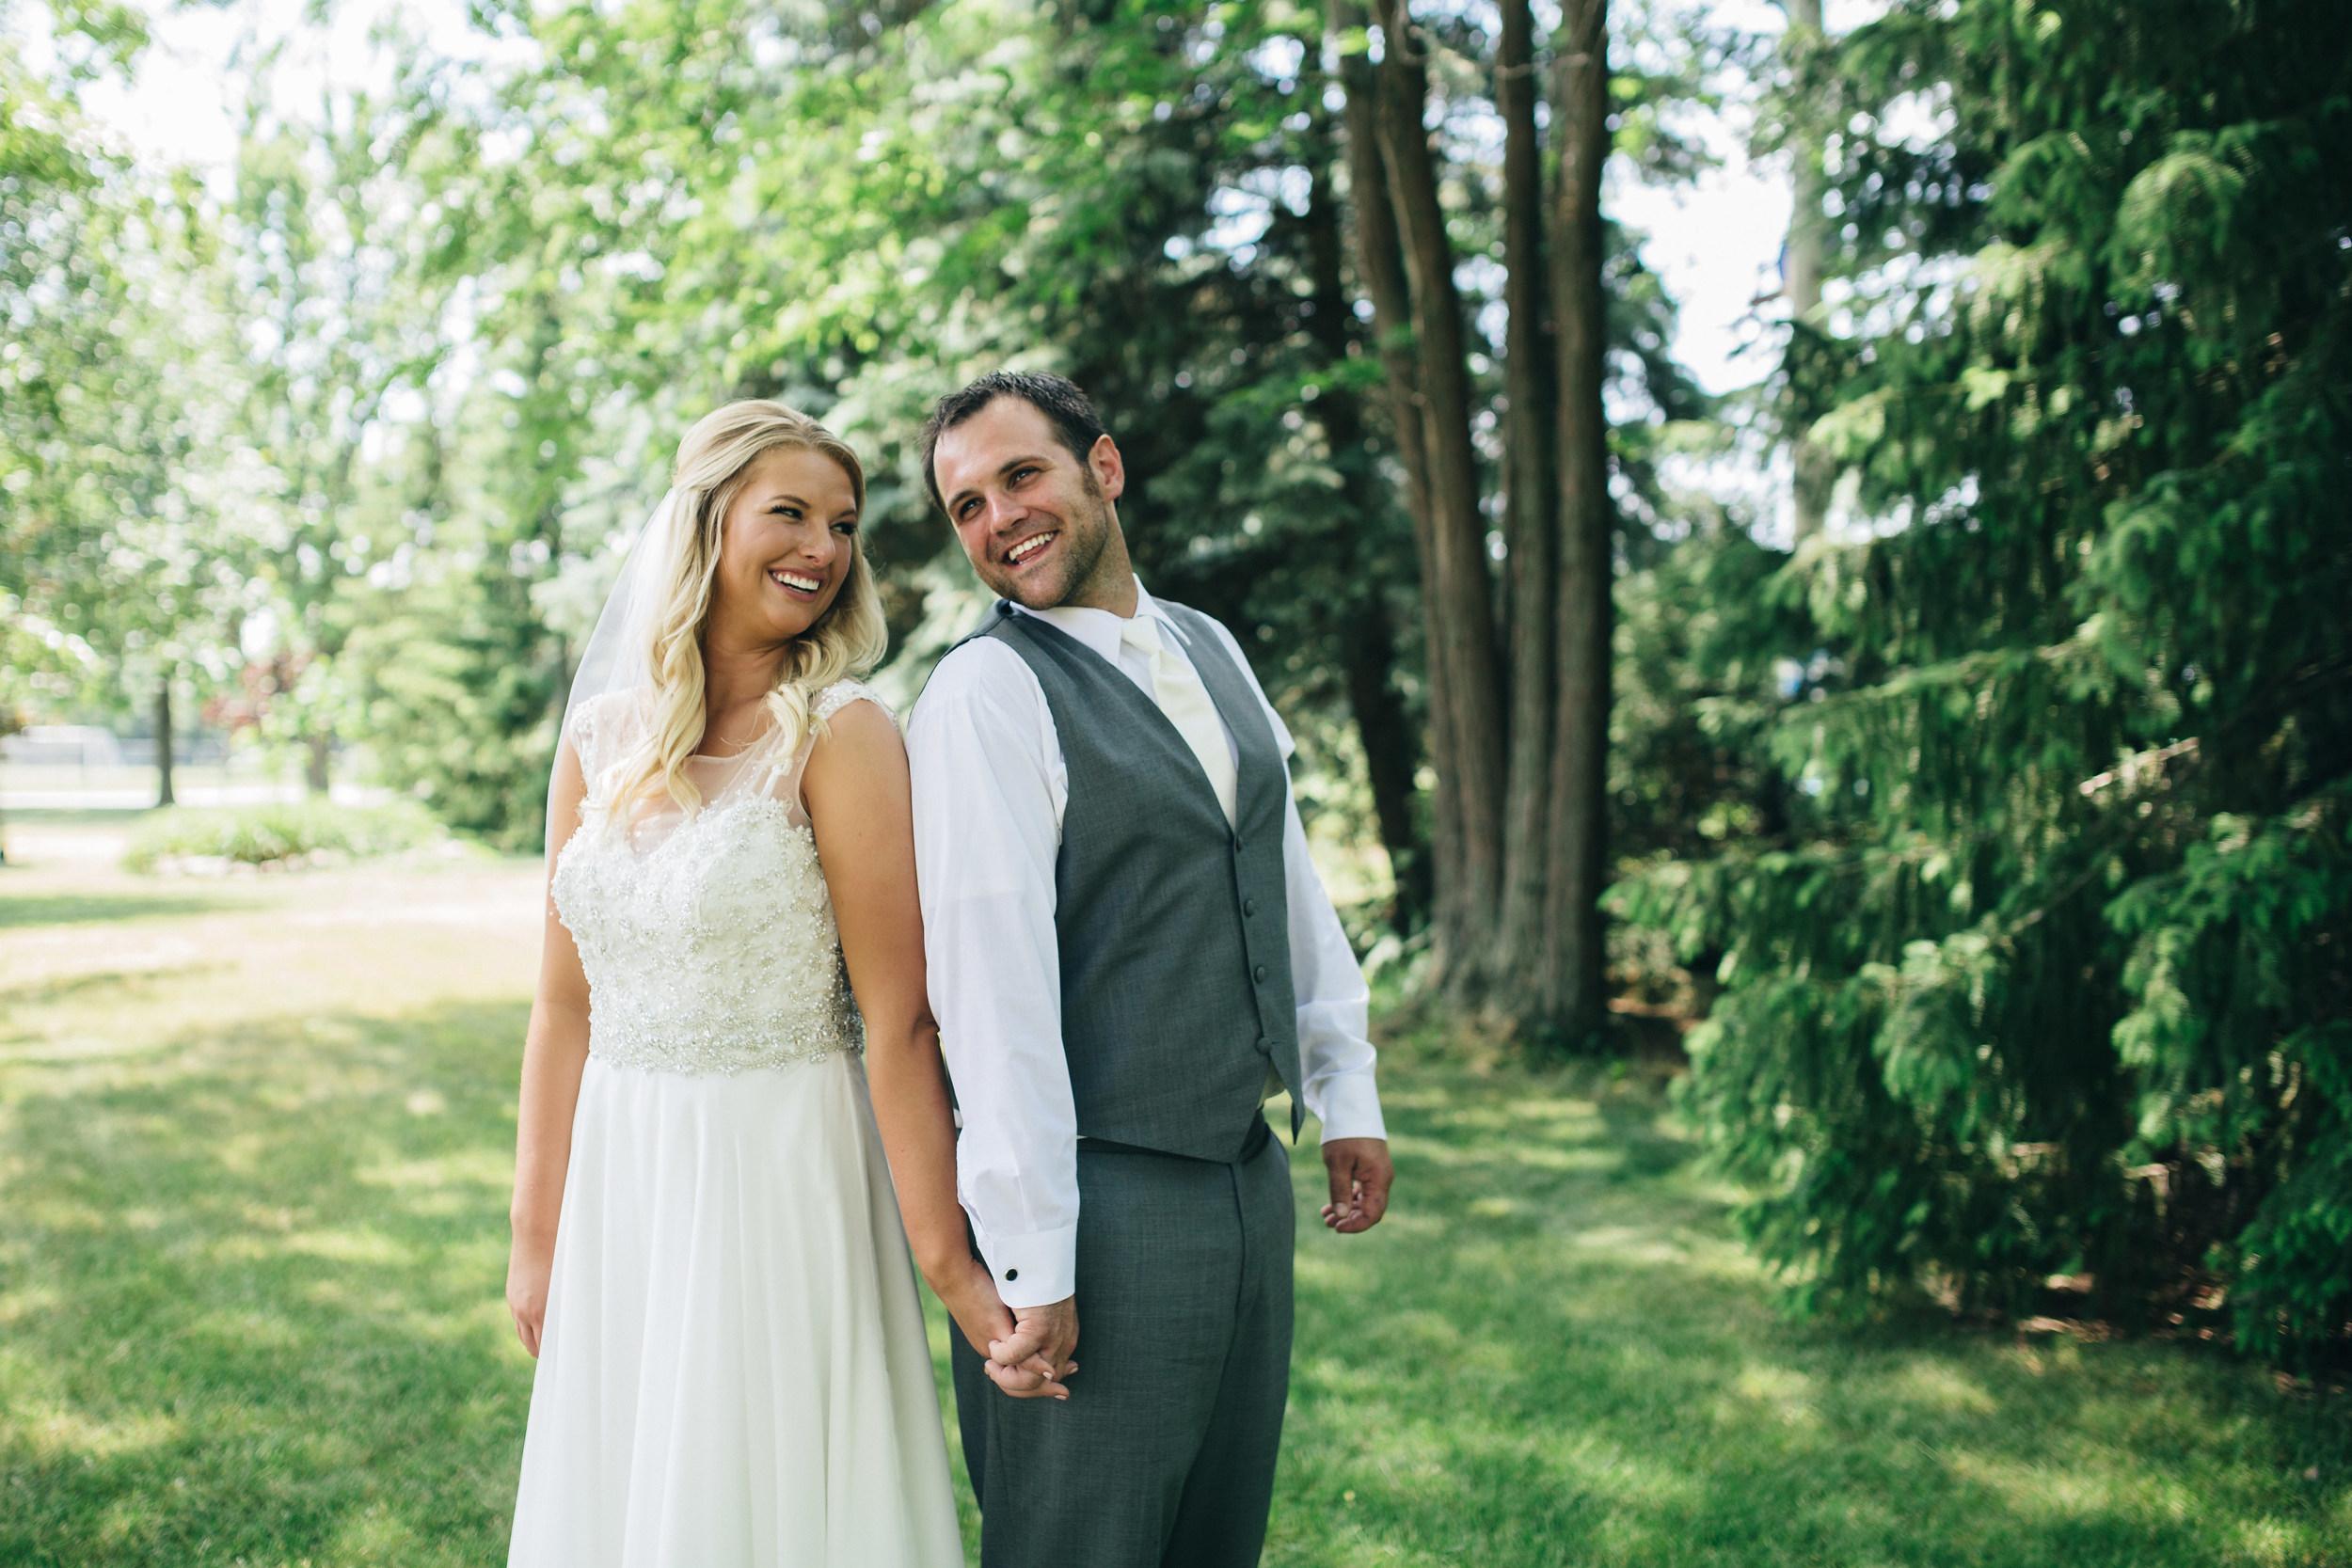 Bride and groom wedding photography at Oak Shade Grove.